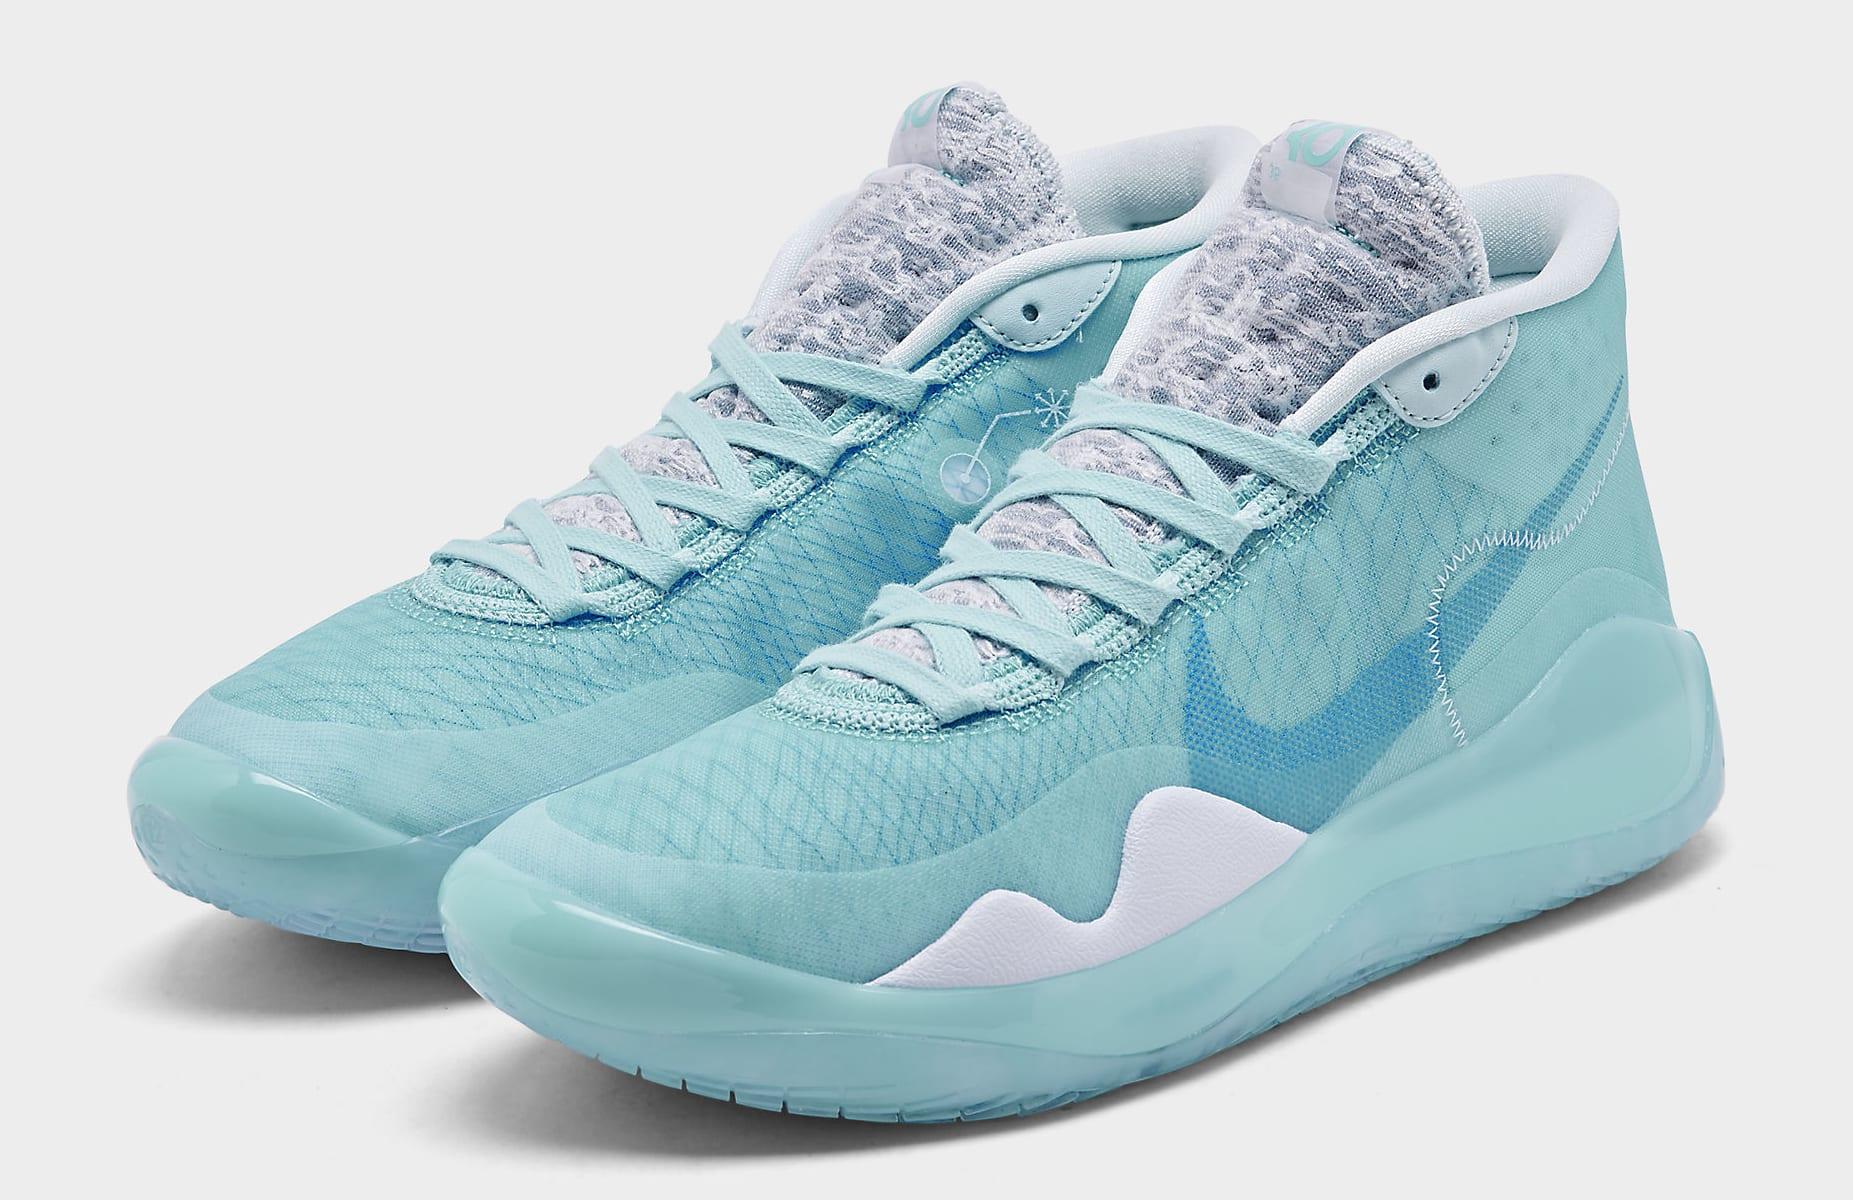 Nike KD 12 Blue Gaze Release Date AR4229-400 Pair